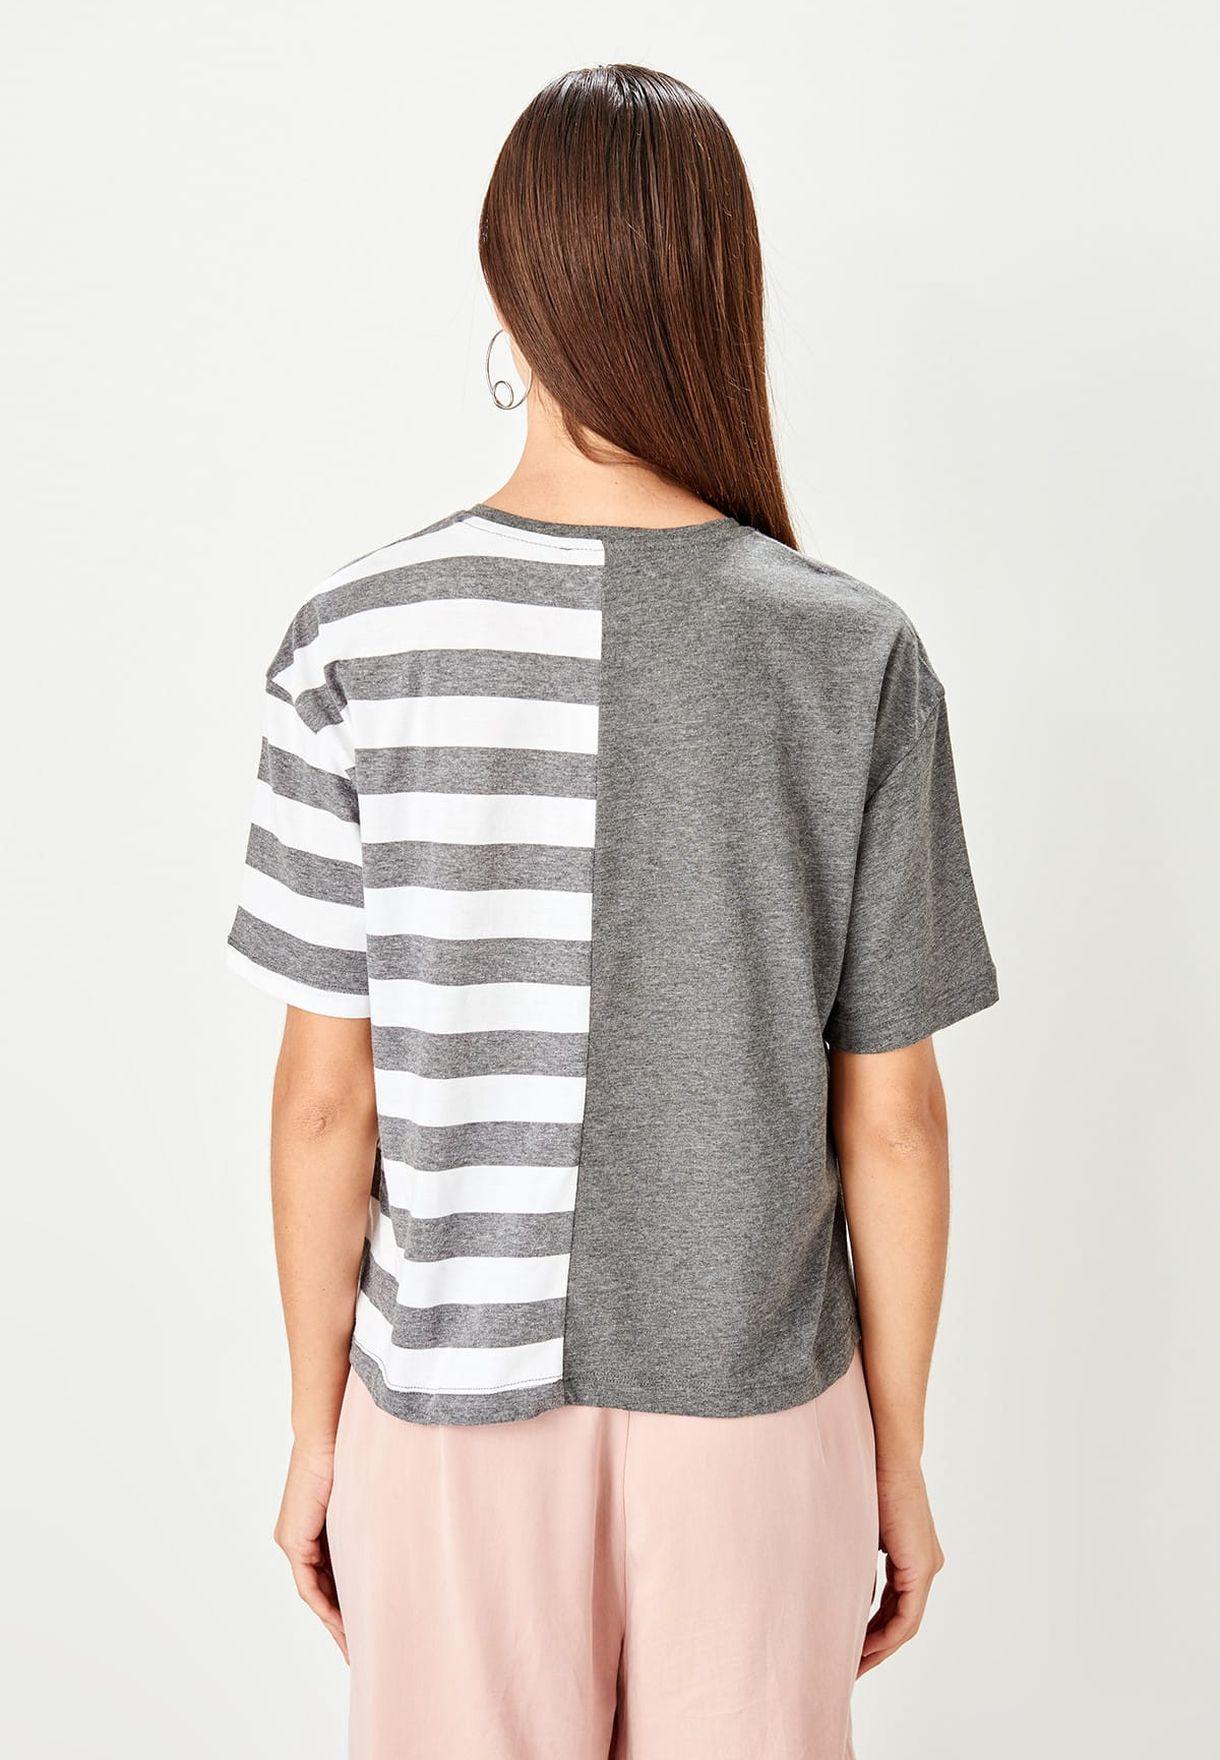 Buy Trendyol Grey Crew Neck Striped T-shirt For Women, Uae 27680atrasgp